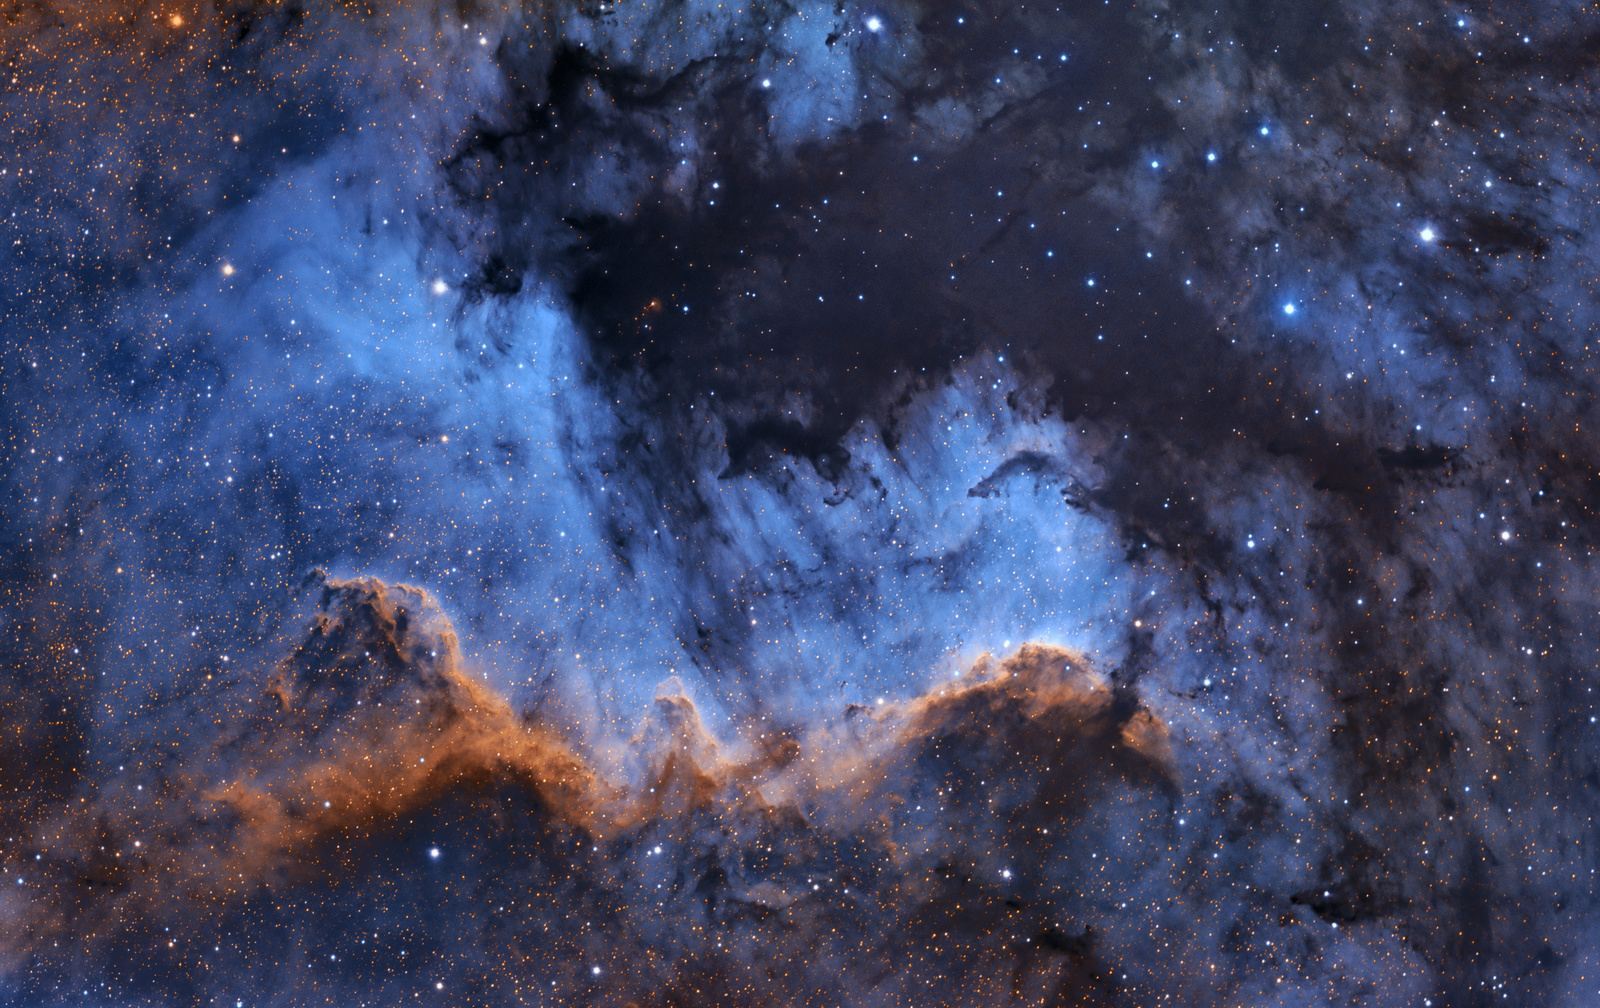 1673598356_NGC7000SHOJSzyma.thumb.jpg.5e9009560c16531da7c9aacfd970f636.jpg